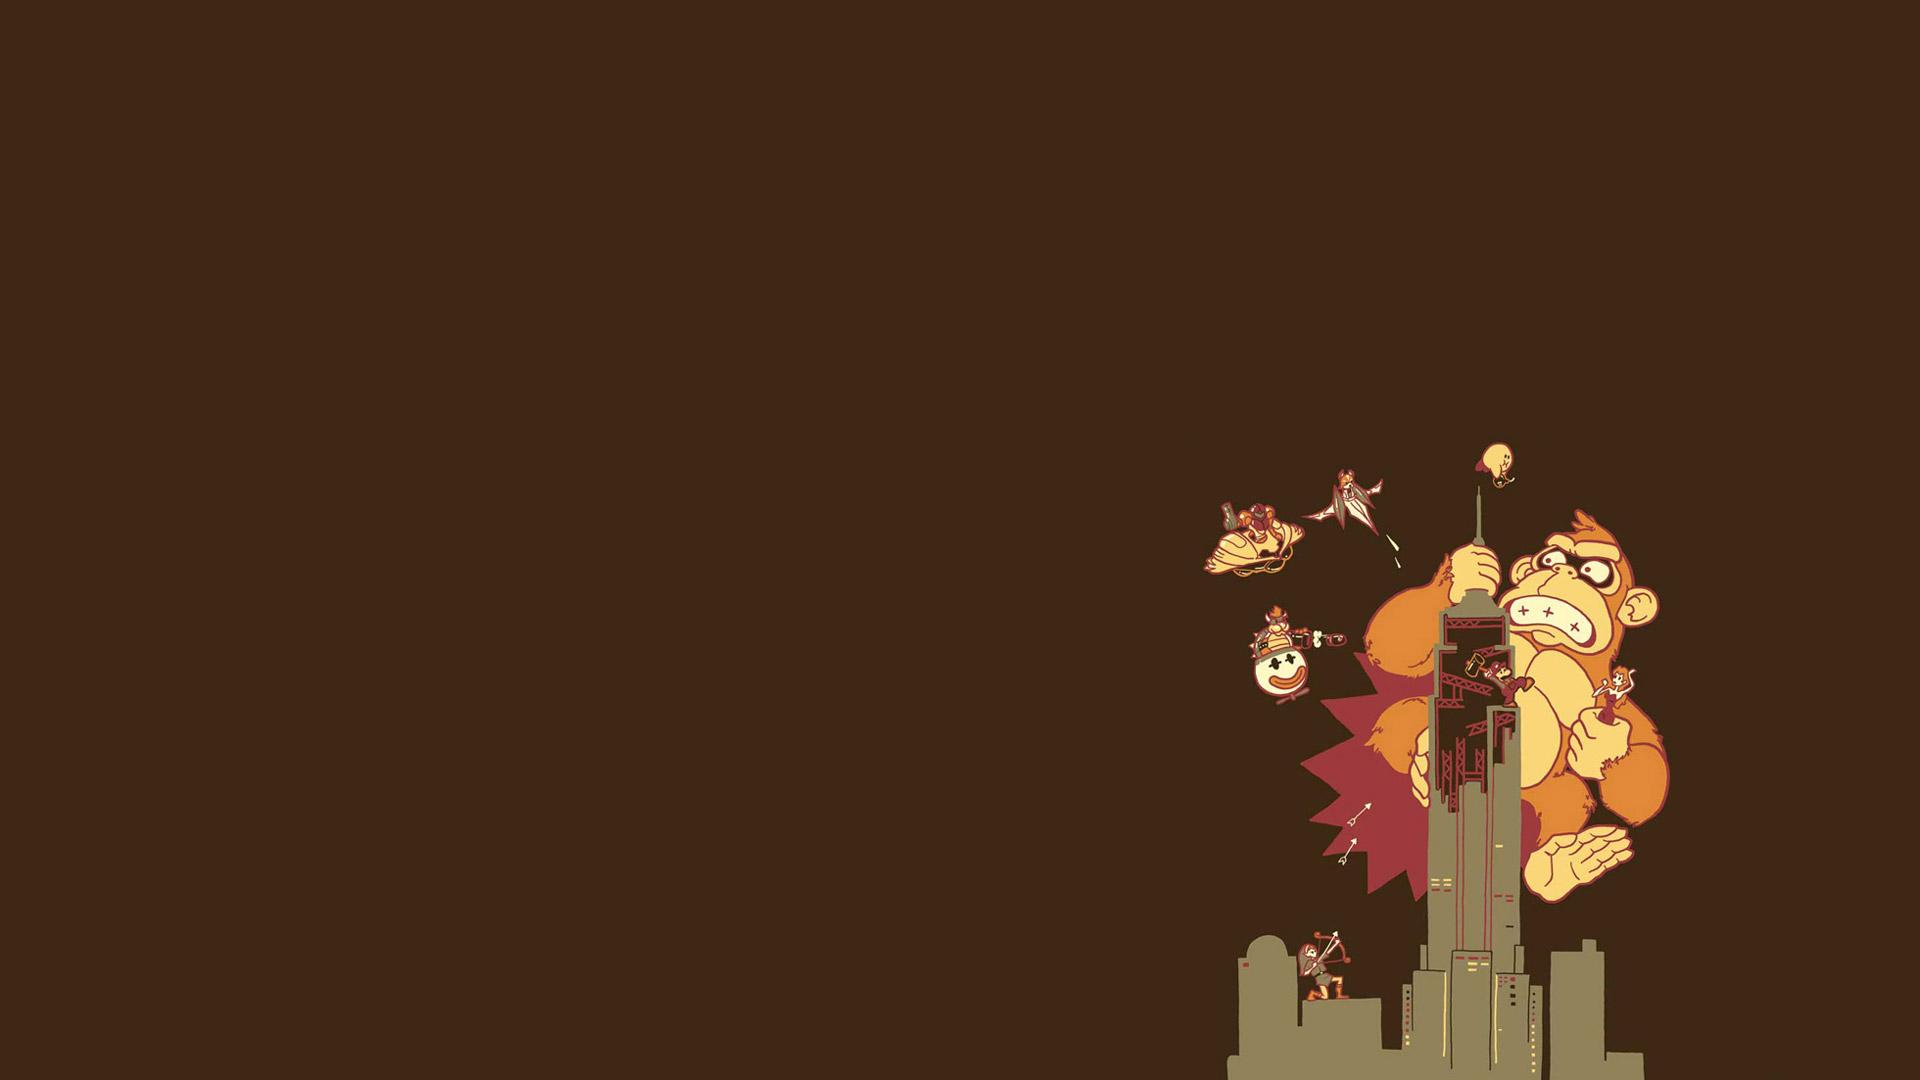 Great Wallpaper Home Screen Donkey Kong - wallpaper-donkey-kong-nes-1920x1080  Image_483122.jpg